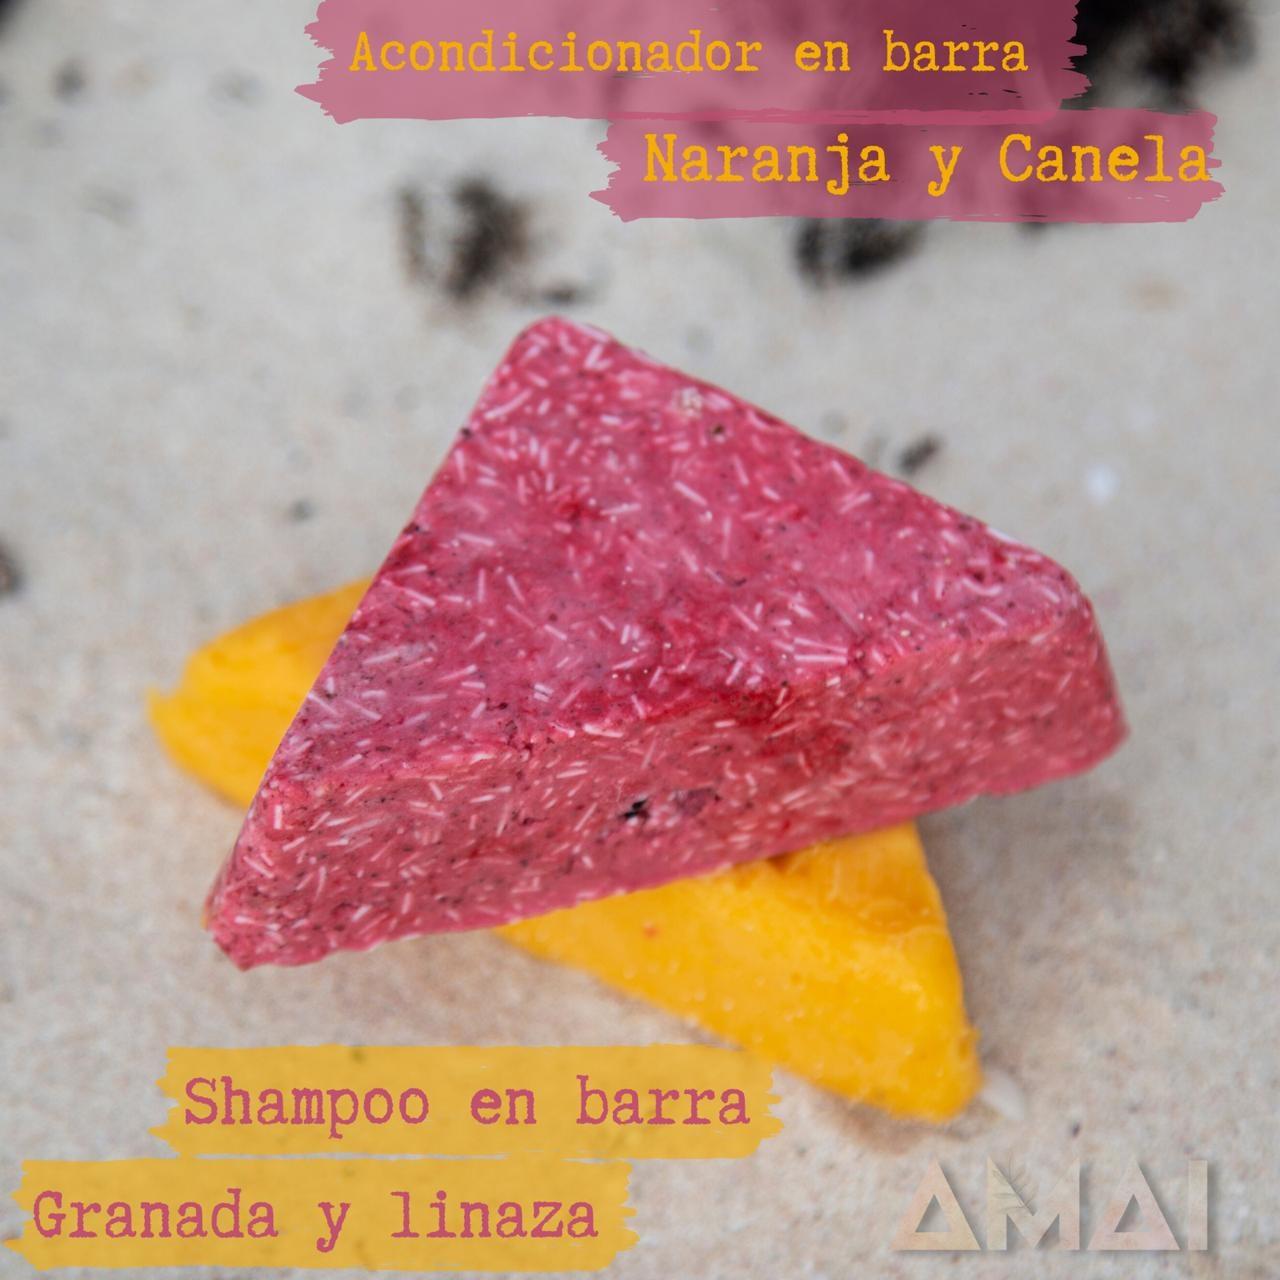 AMAI NATURAL, ACONDICIONADOR EN BARRA DE NARANJA Y CANELA